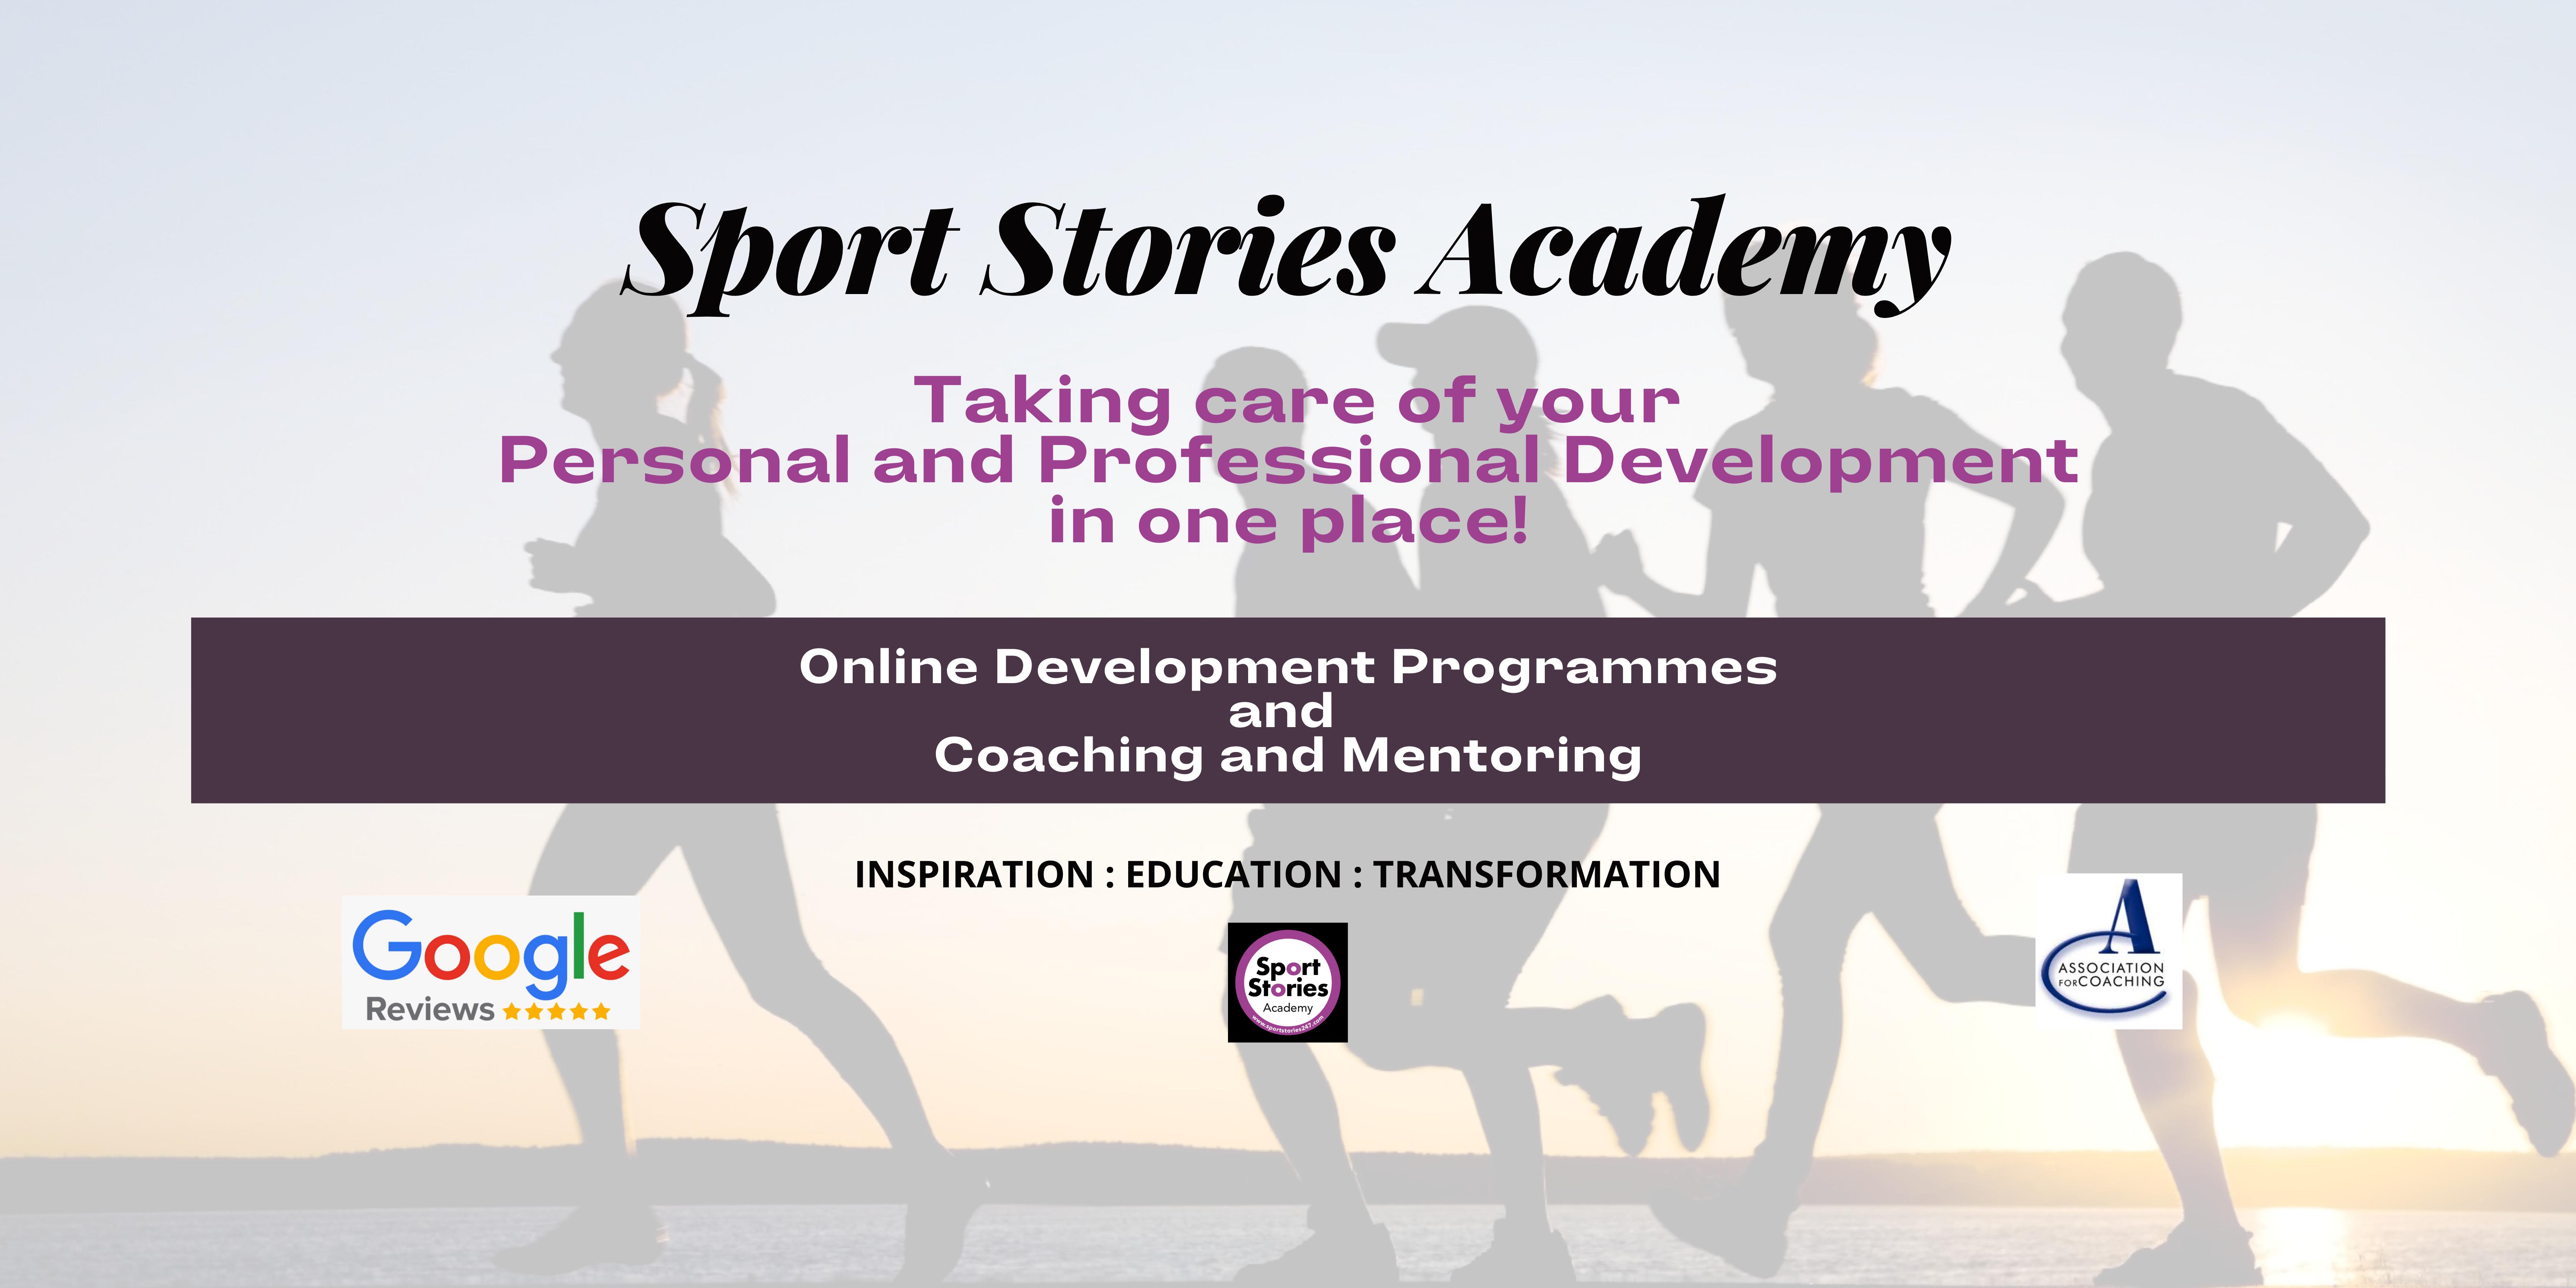 Sport Stories Academy